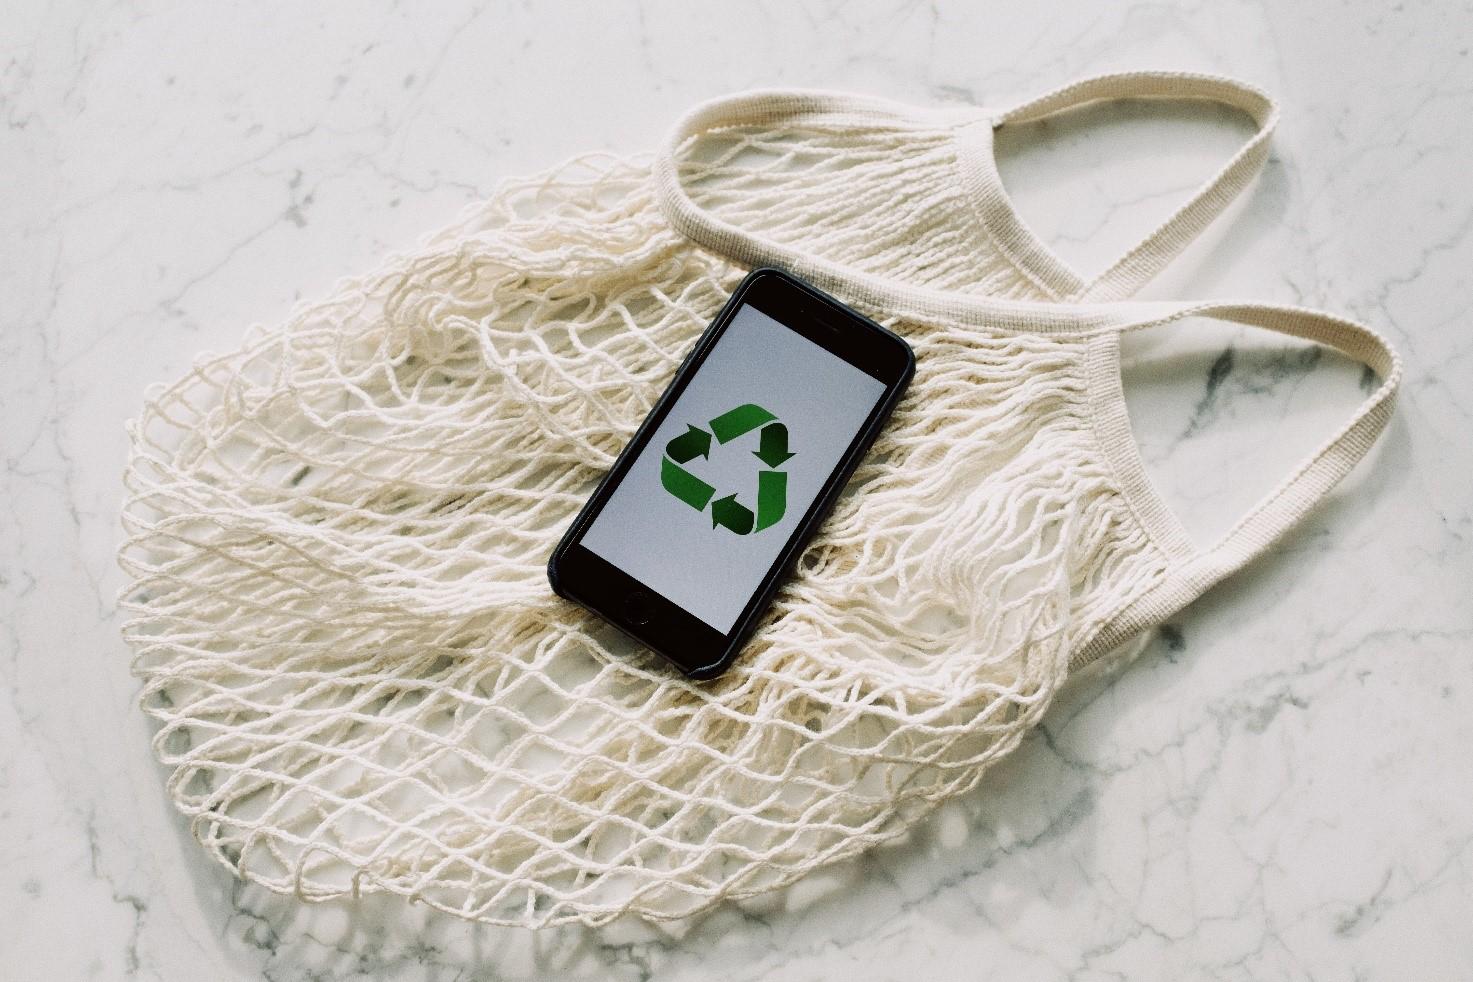 You are currently viewing Älypuhelimet ja tabletit saavat kiertotalous- ja energiatehokkuusvaatimuksia